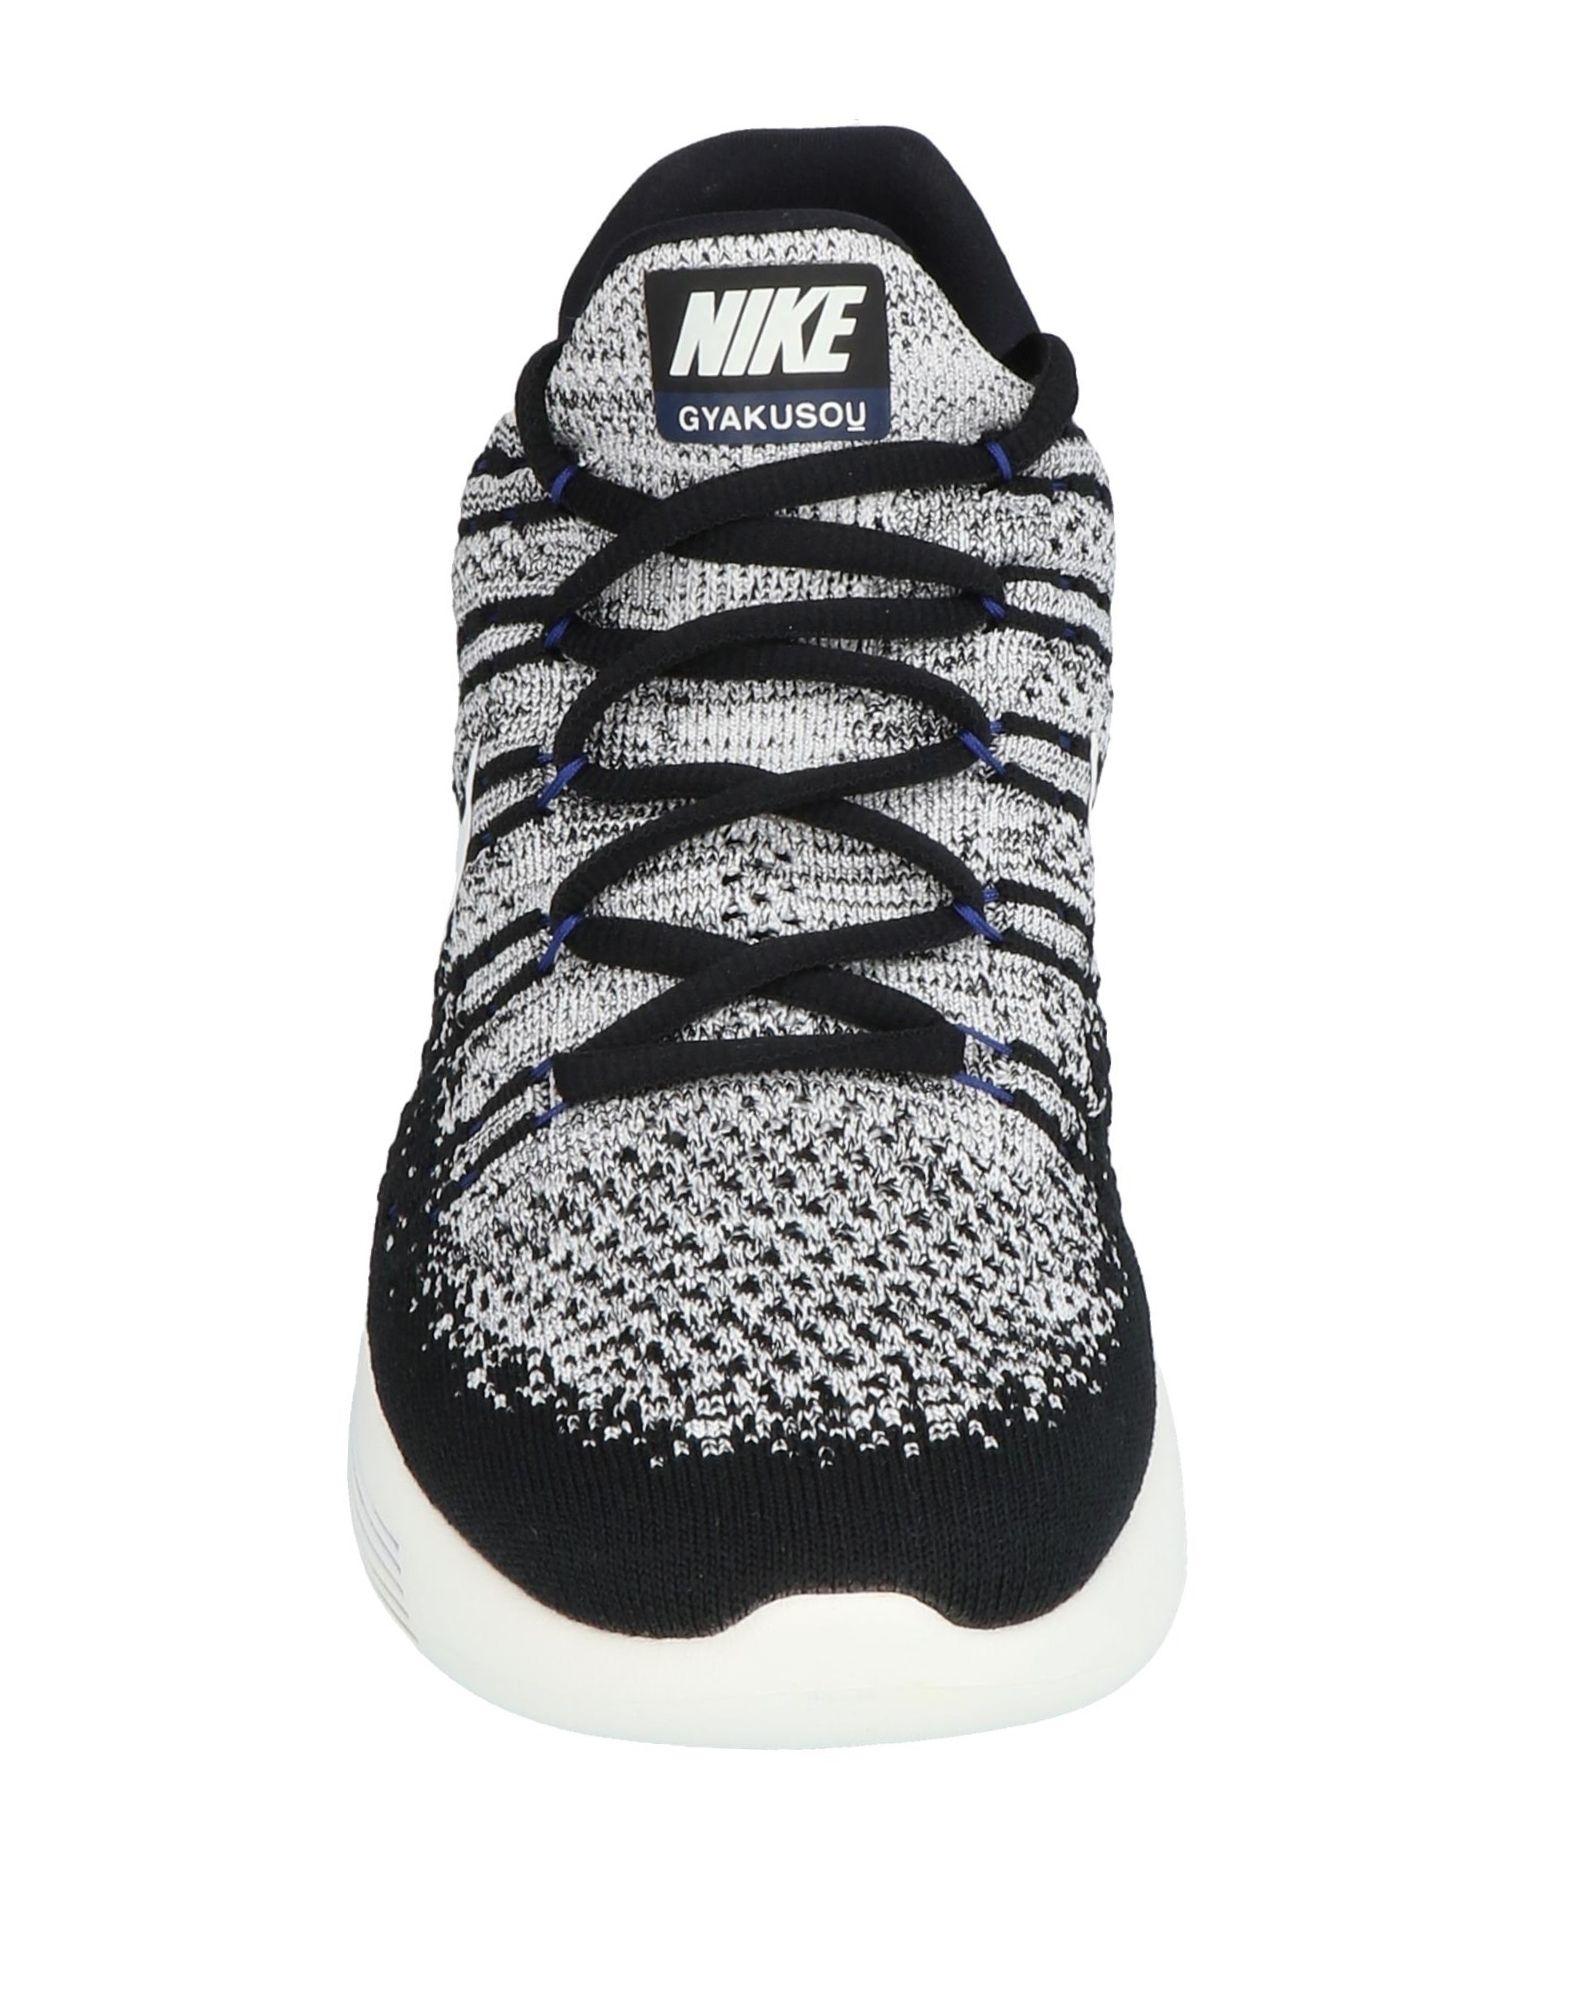 a8fbf22df8815 NIKE ΠΑΠΟΥΤΣΙΑ Παπούτσια τένις χαμηλά